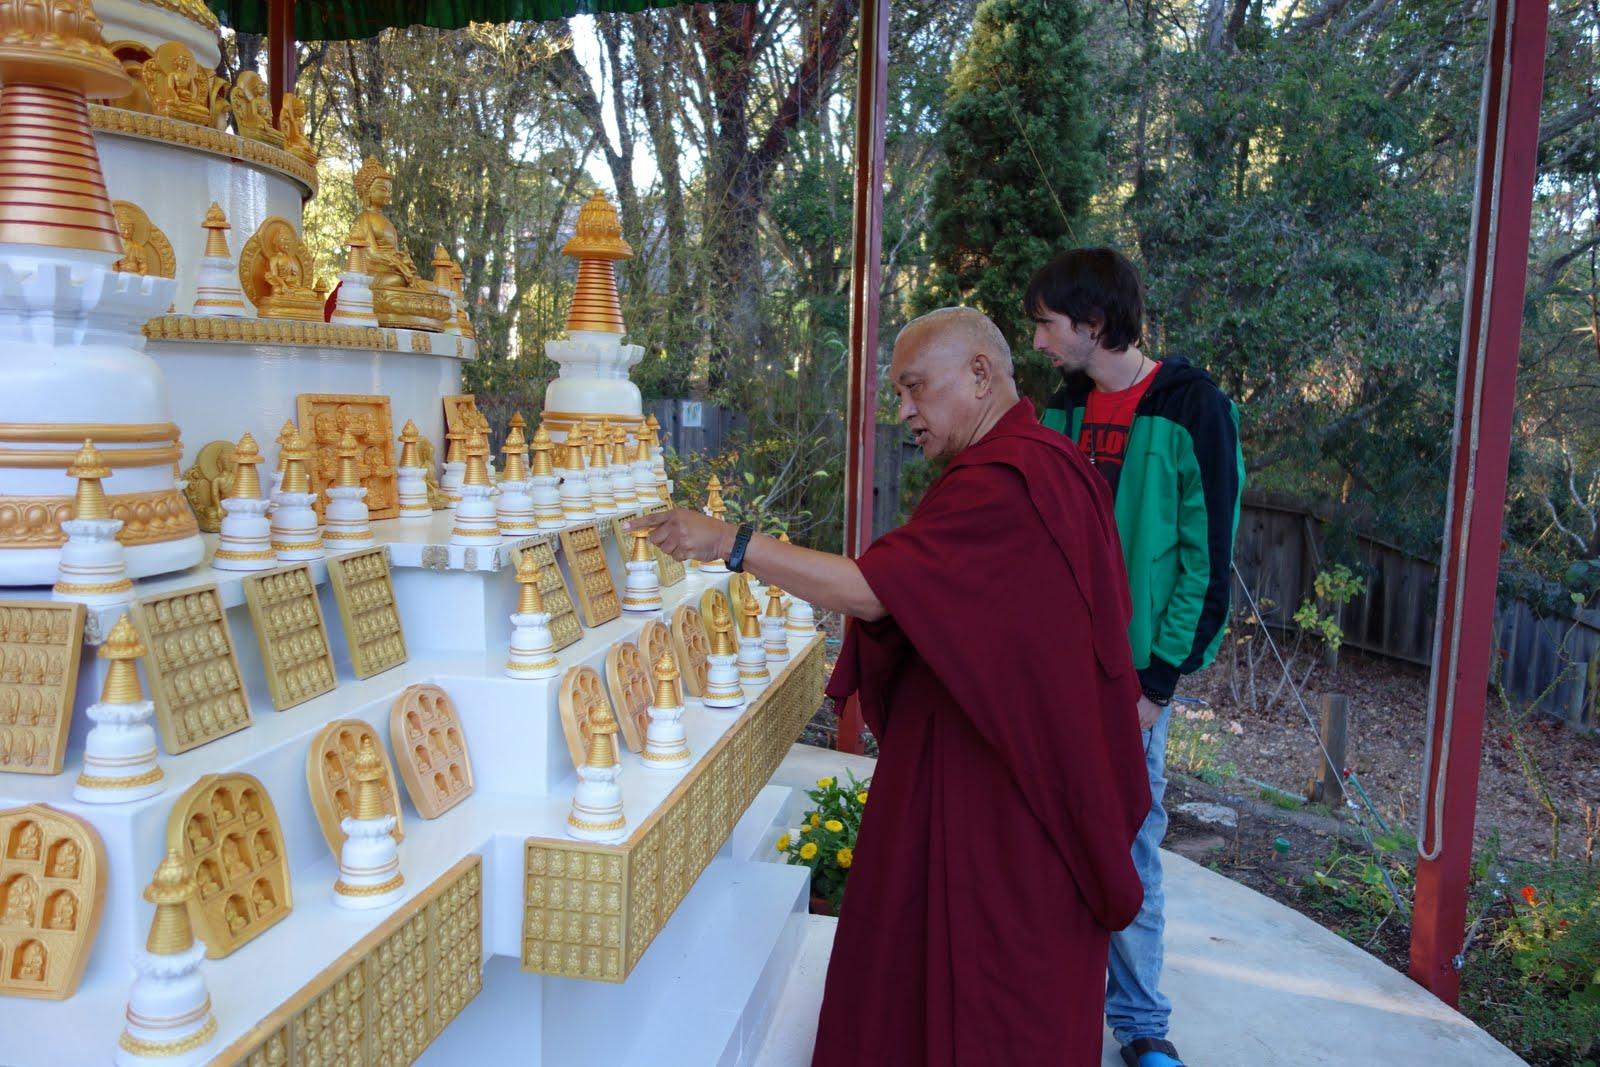 Tenzin Ösel visits Rinpoche at his house in Aptos, California. October 2013.